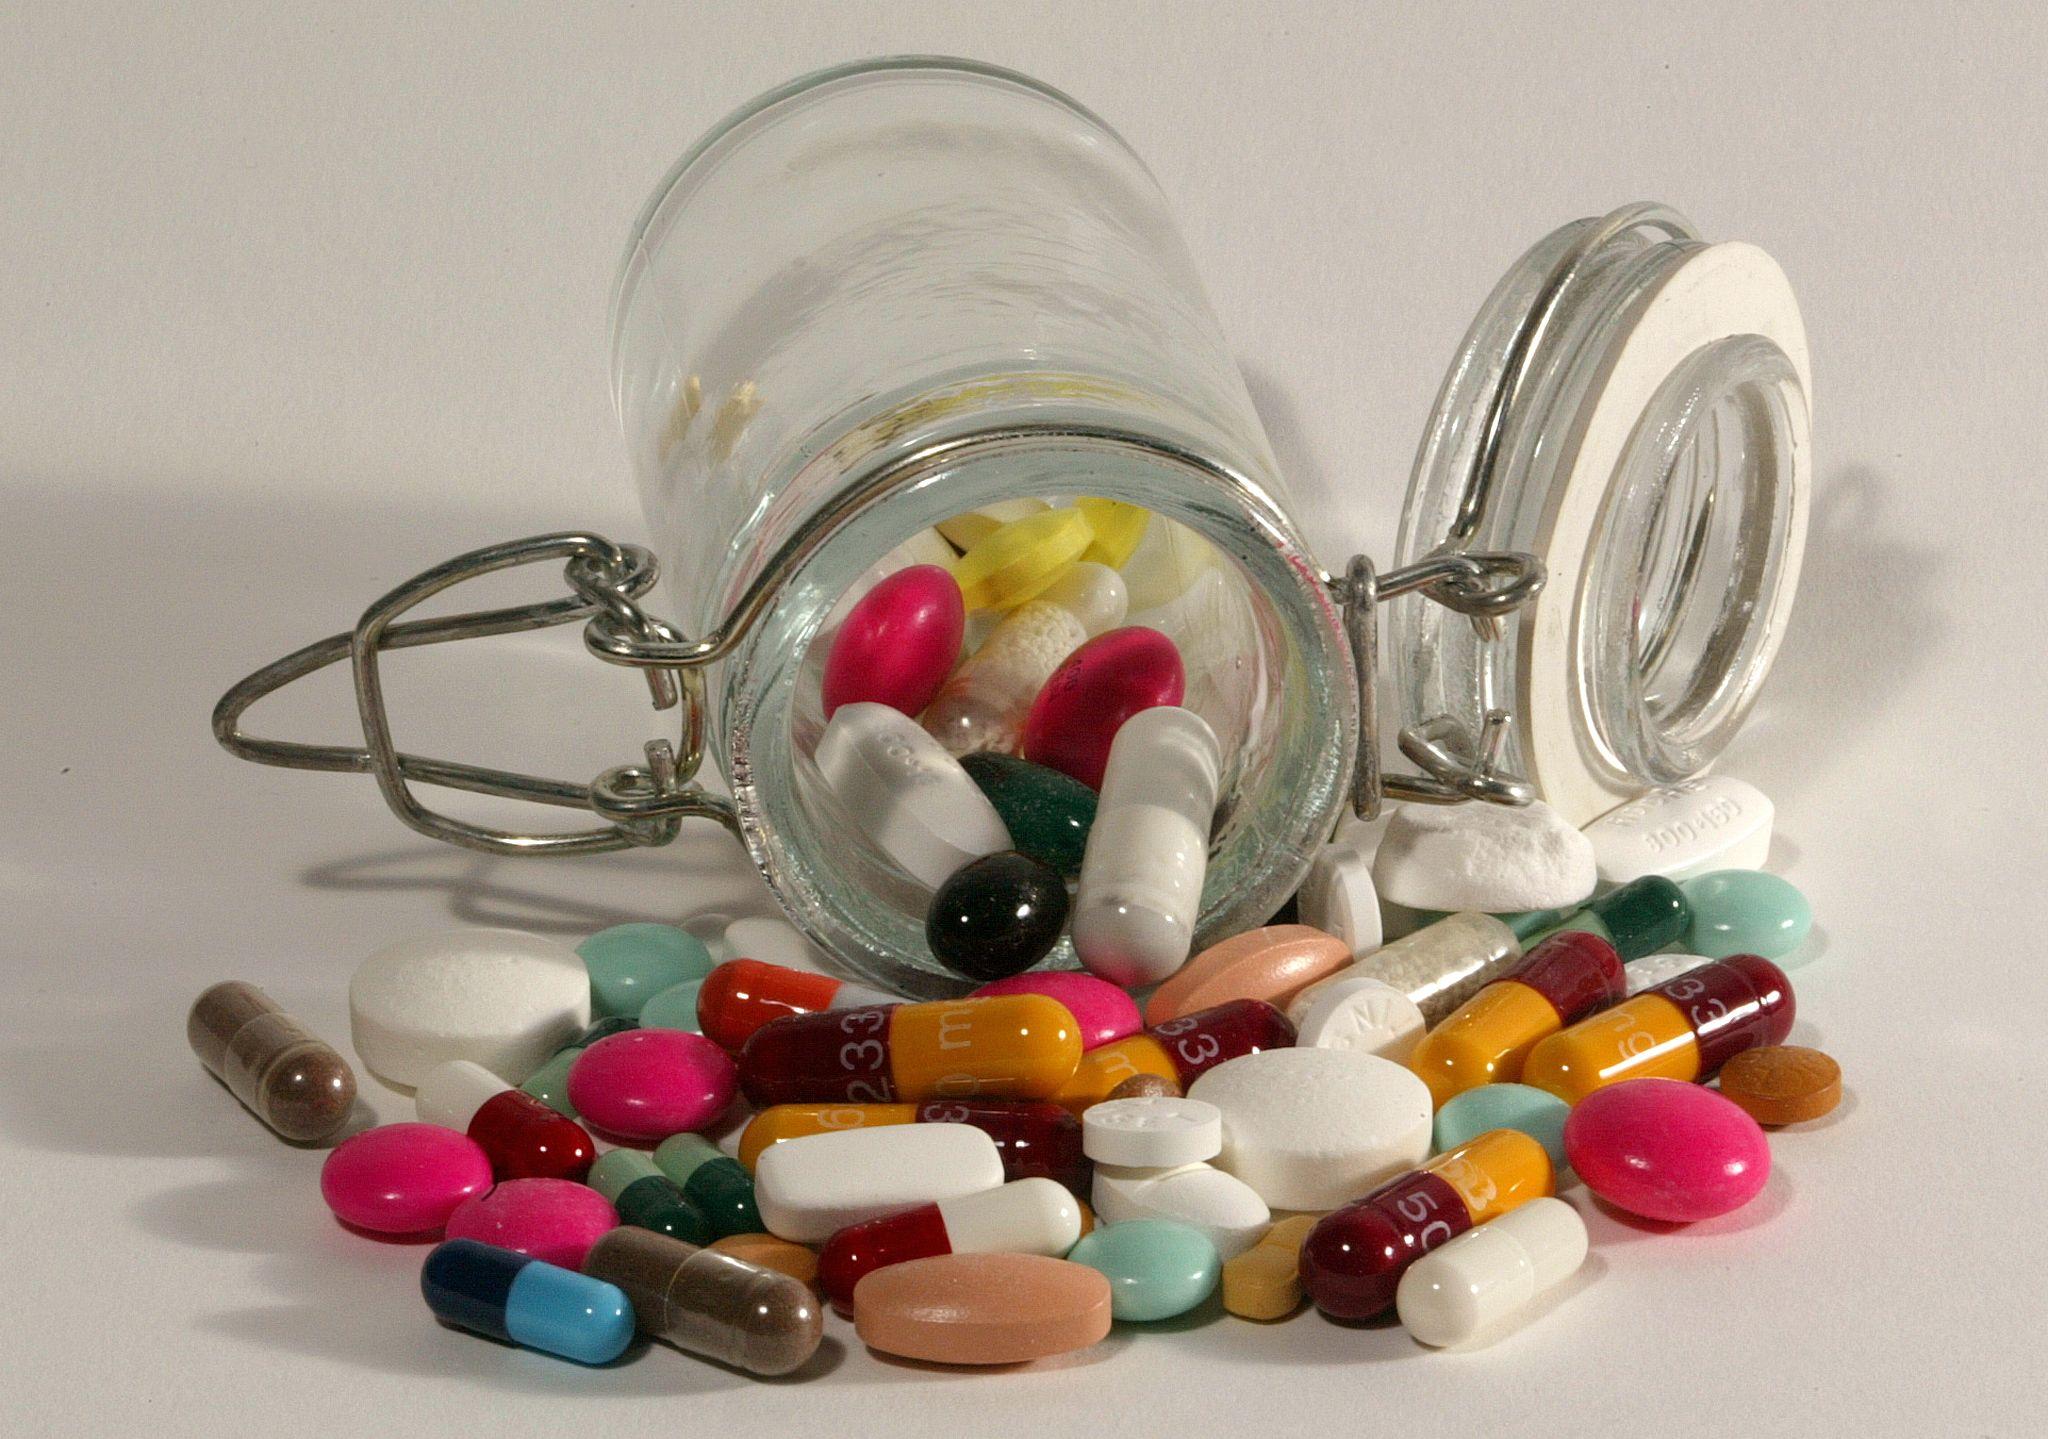 11_20_Drug_Prices